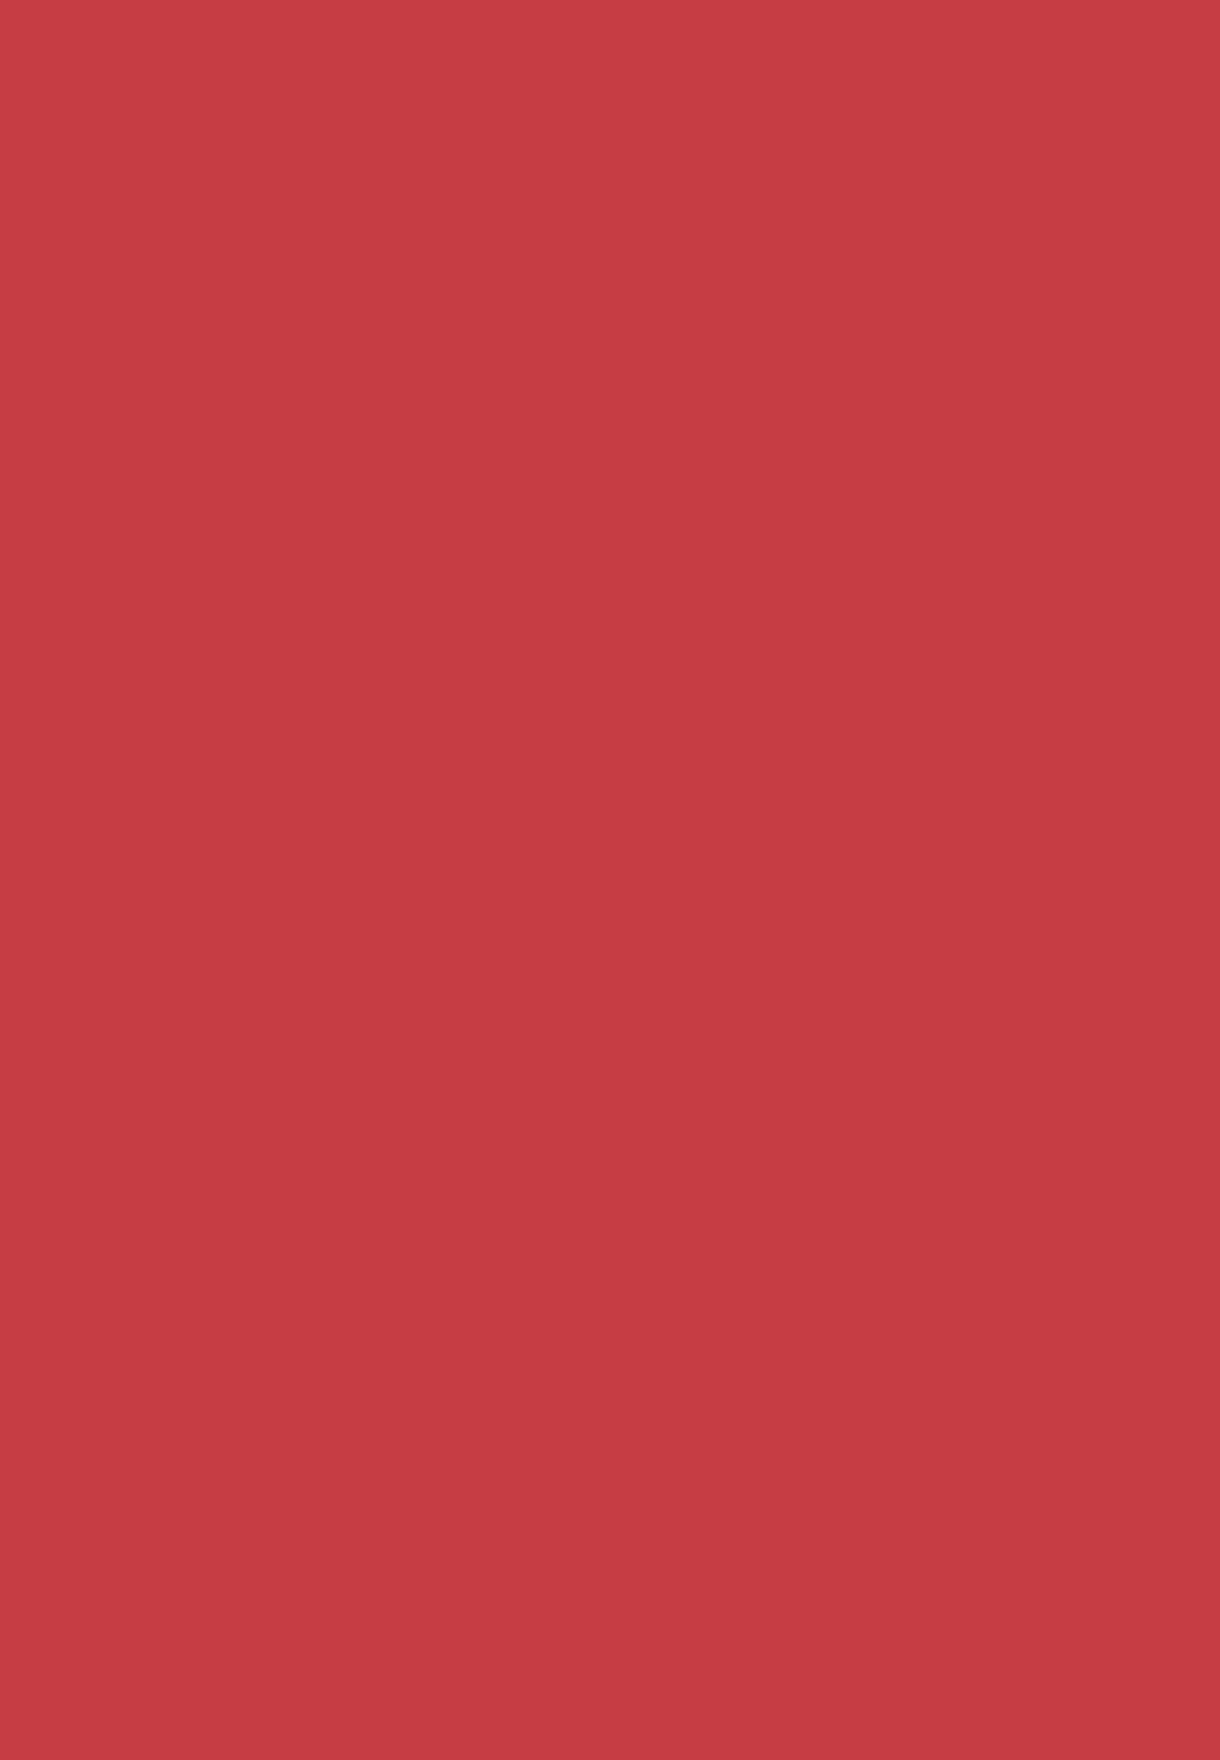 أحمر شفاه ابسولو مت 197